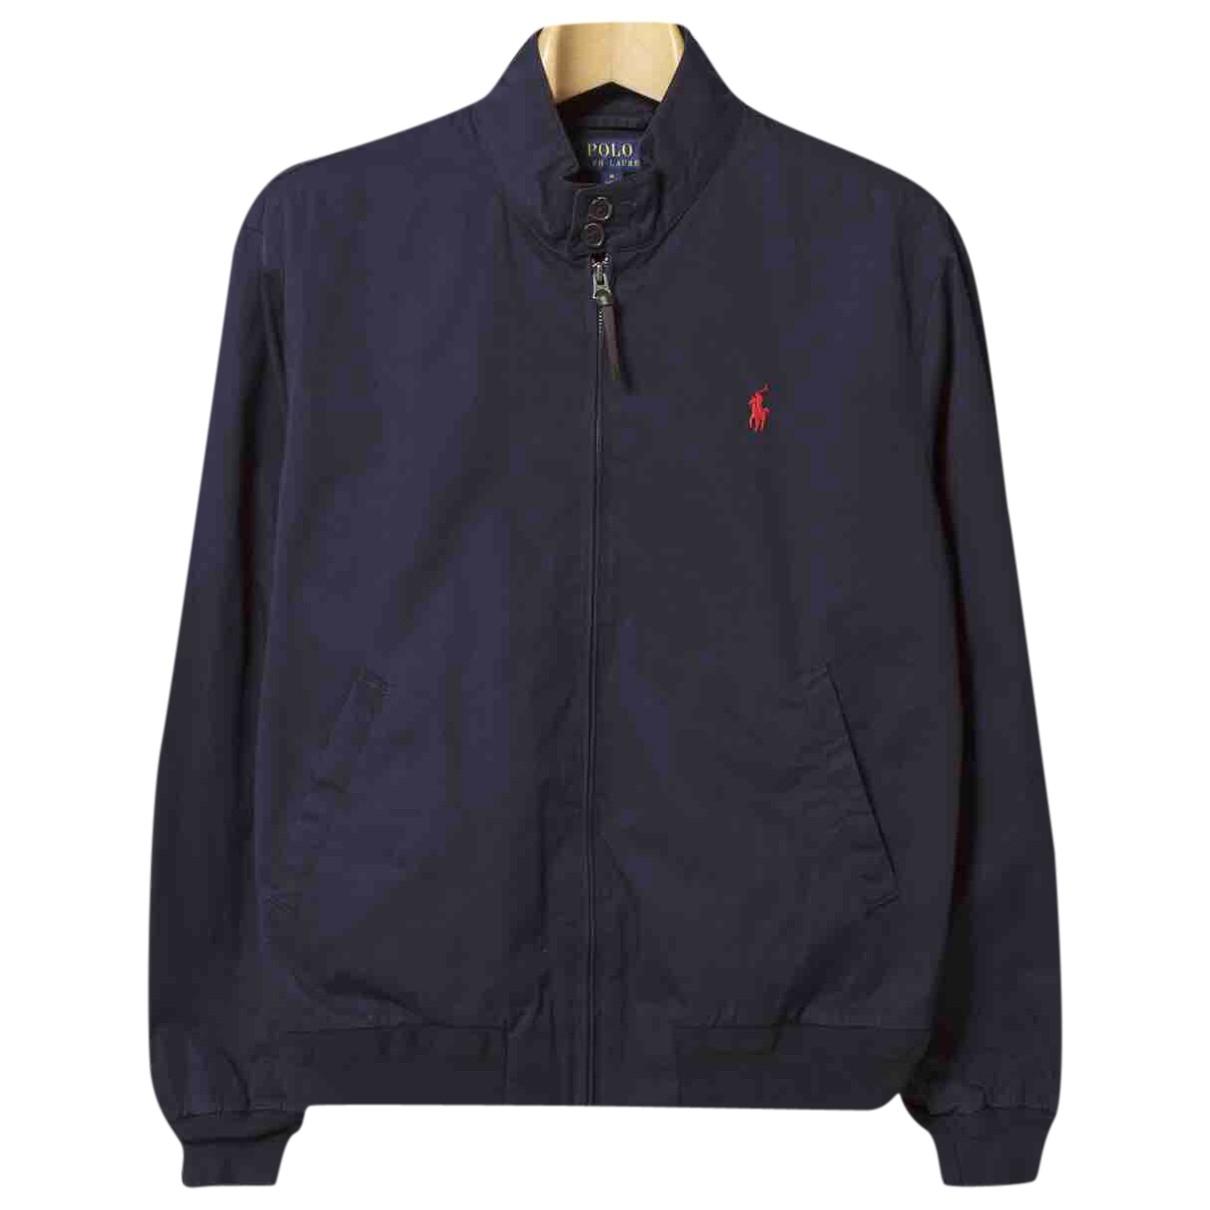 Polo Ralph Lauren \N Blue Cotton jacket  for Men S International